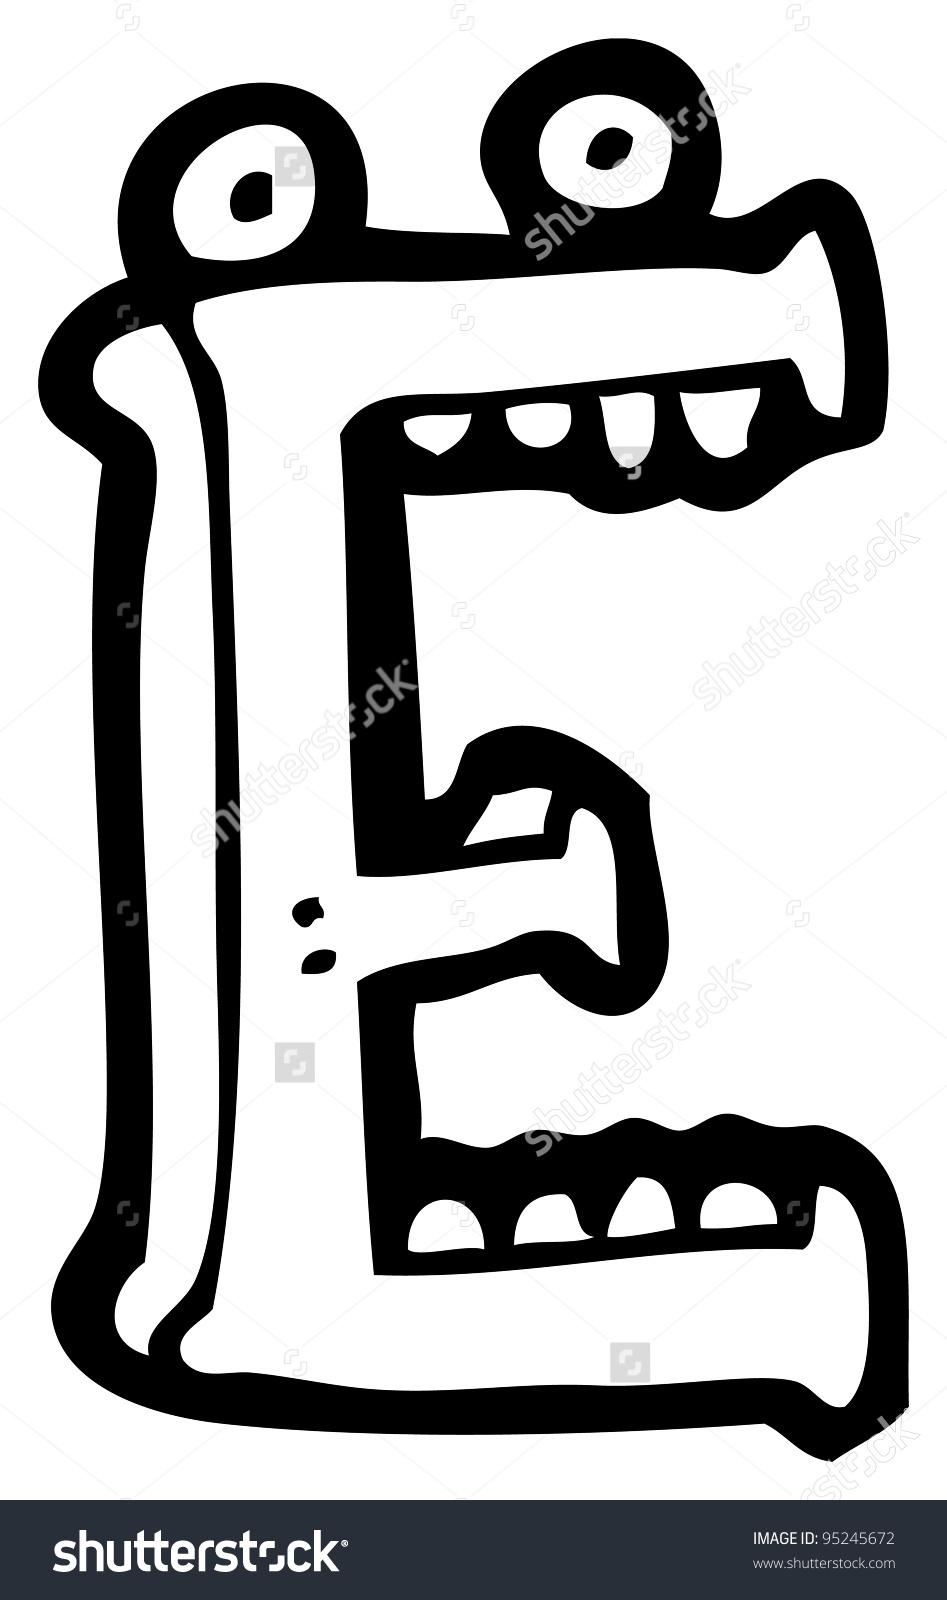 Cartoon Letter E Face Stock Illustration 95245672.